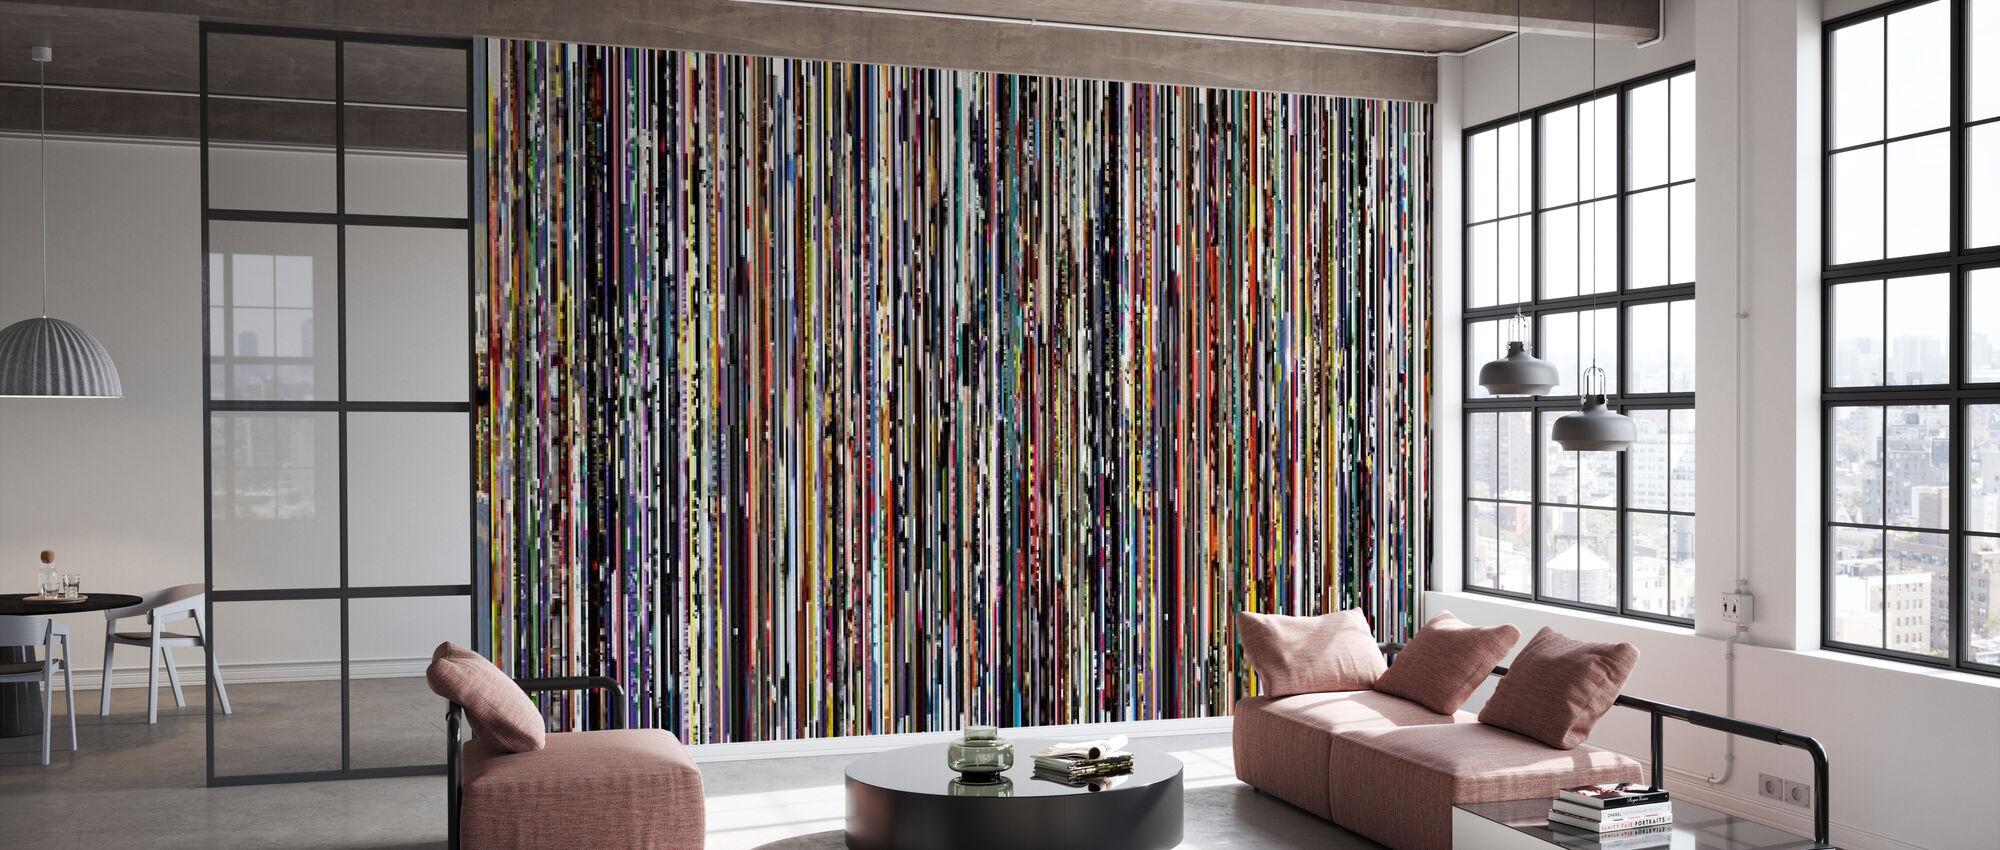 - Datrix - Wallpaper - Office